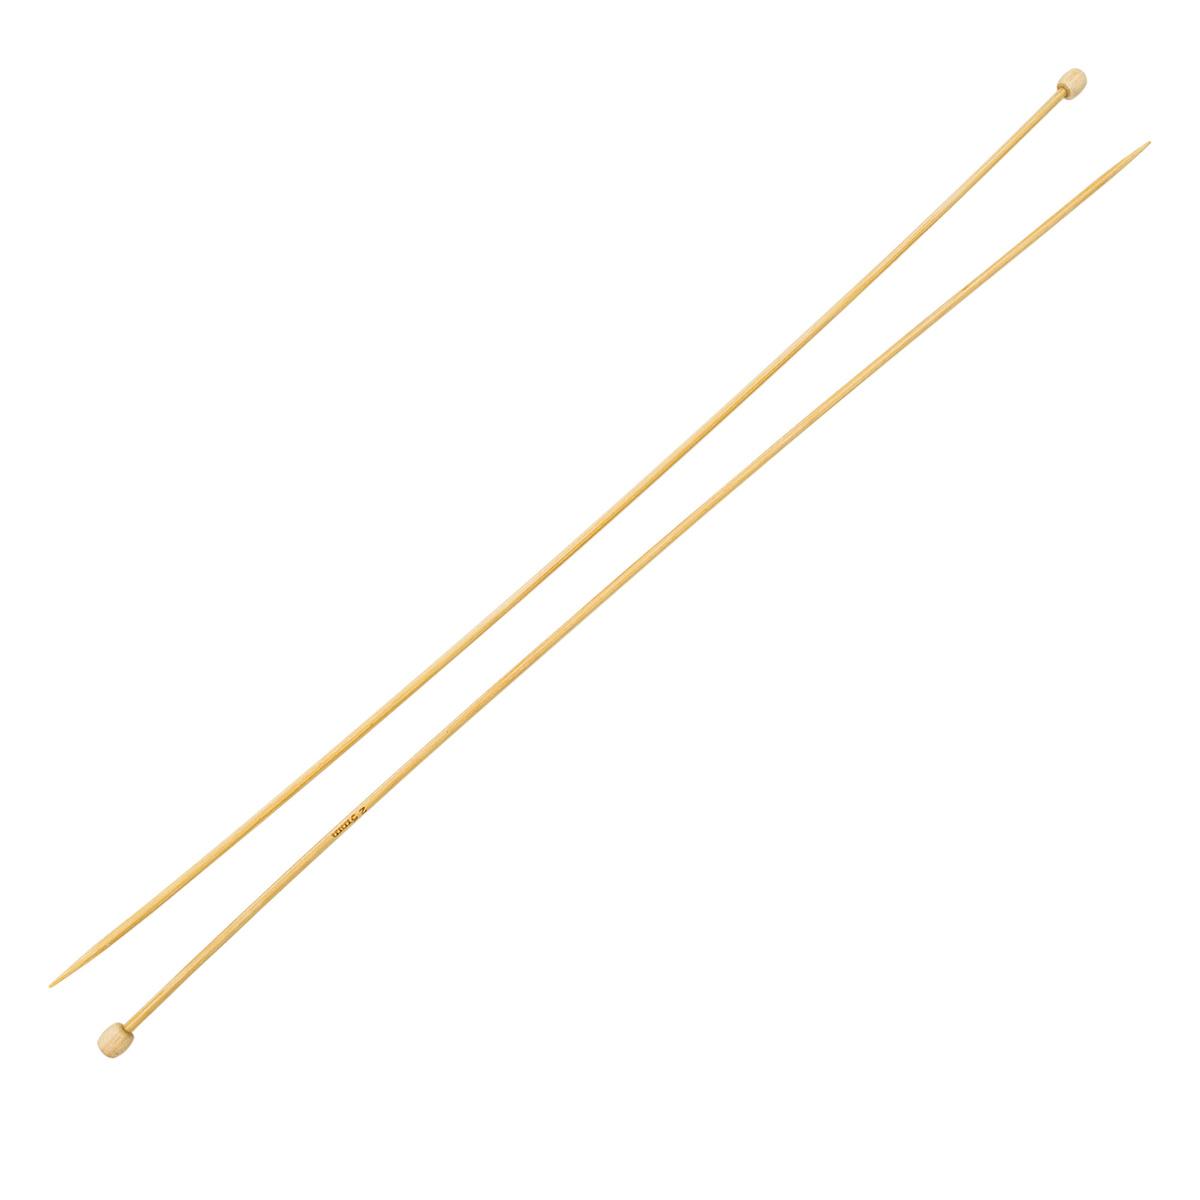 Спицы прямые бамбук 942220, 35 см, 2,0 мм, Hobby&Pro